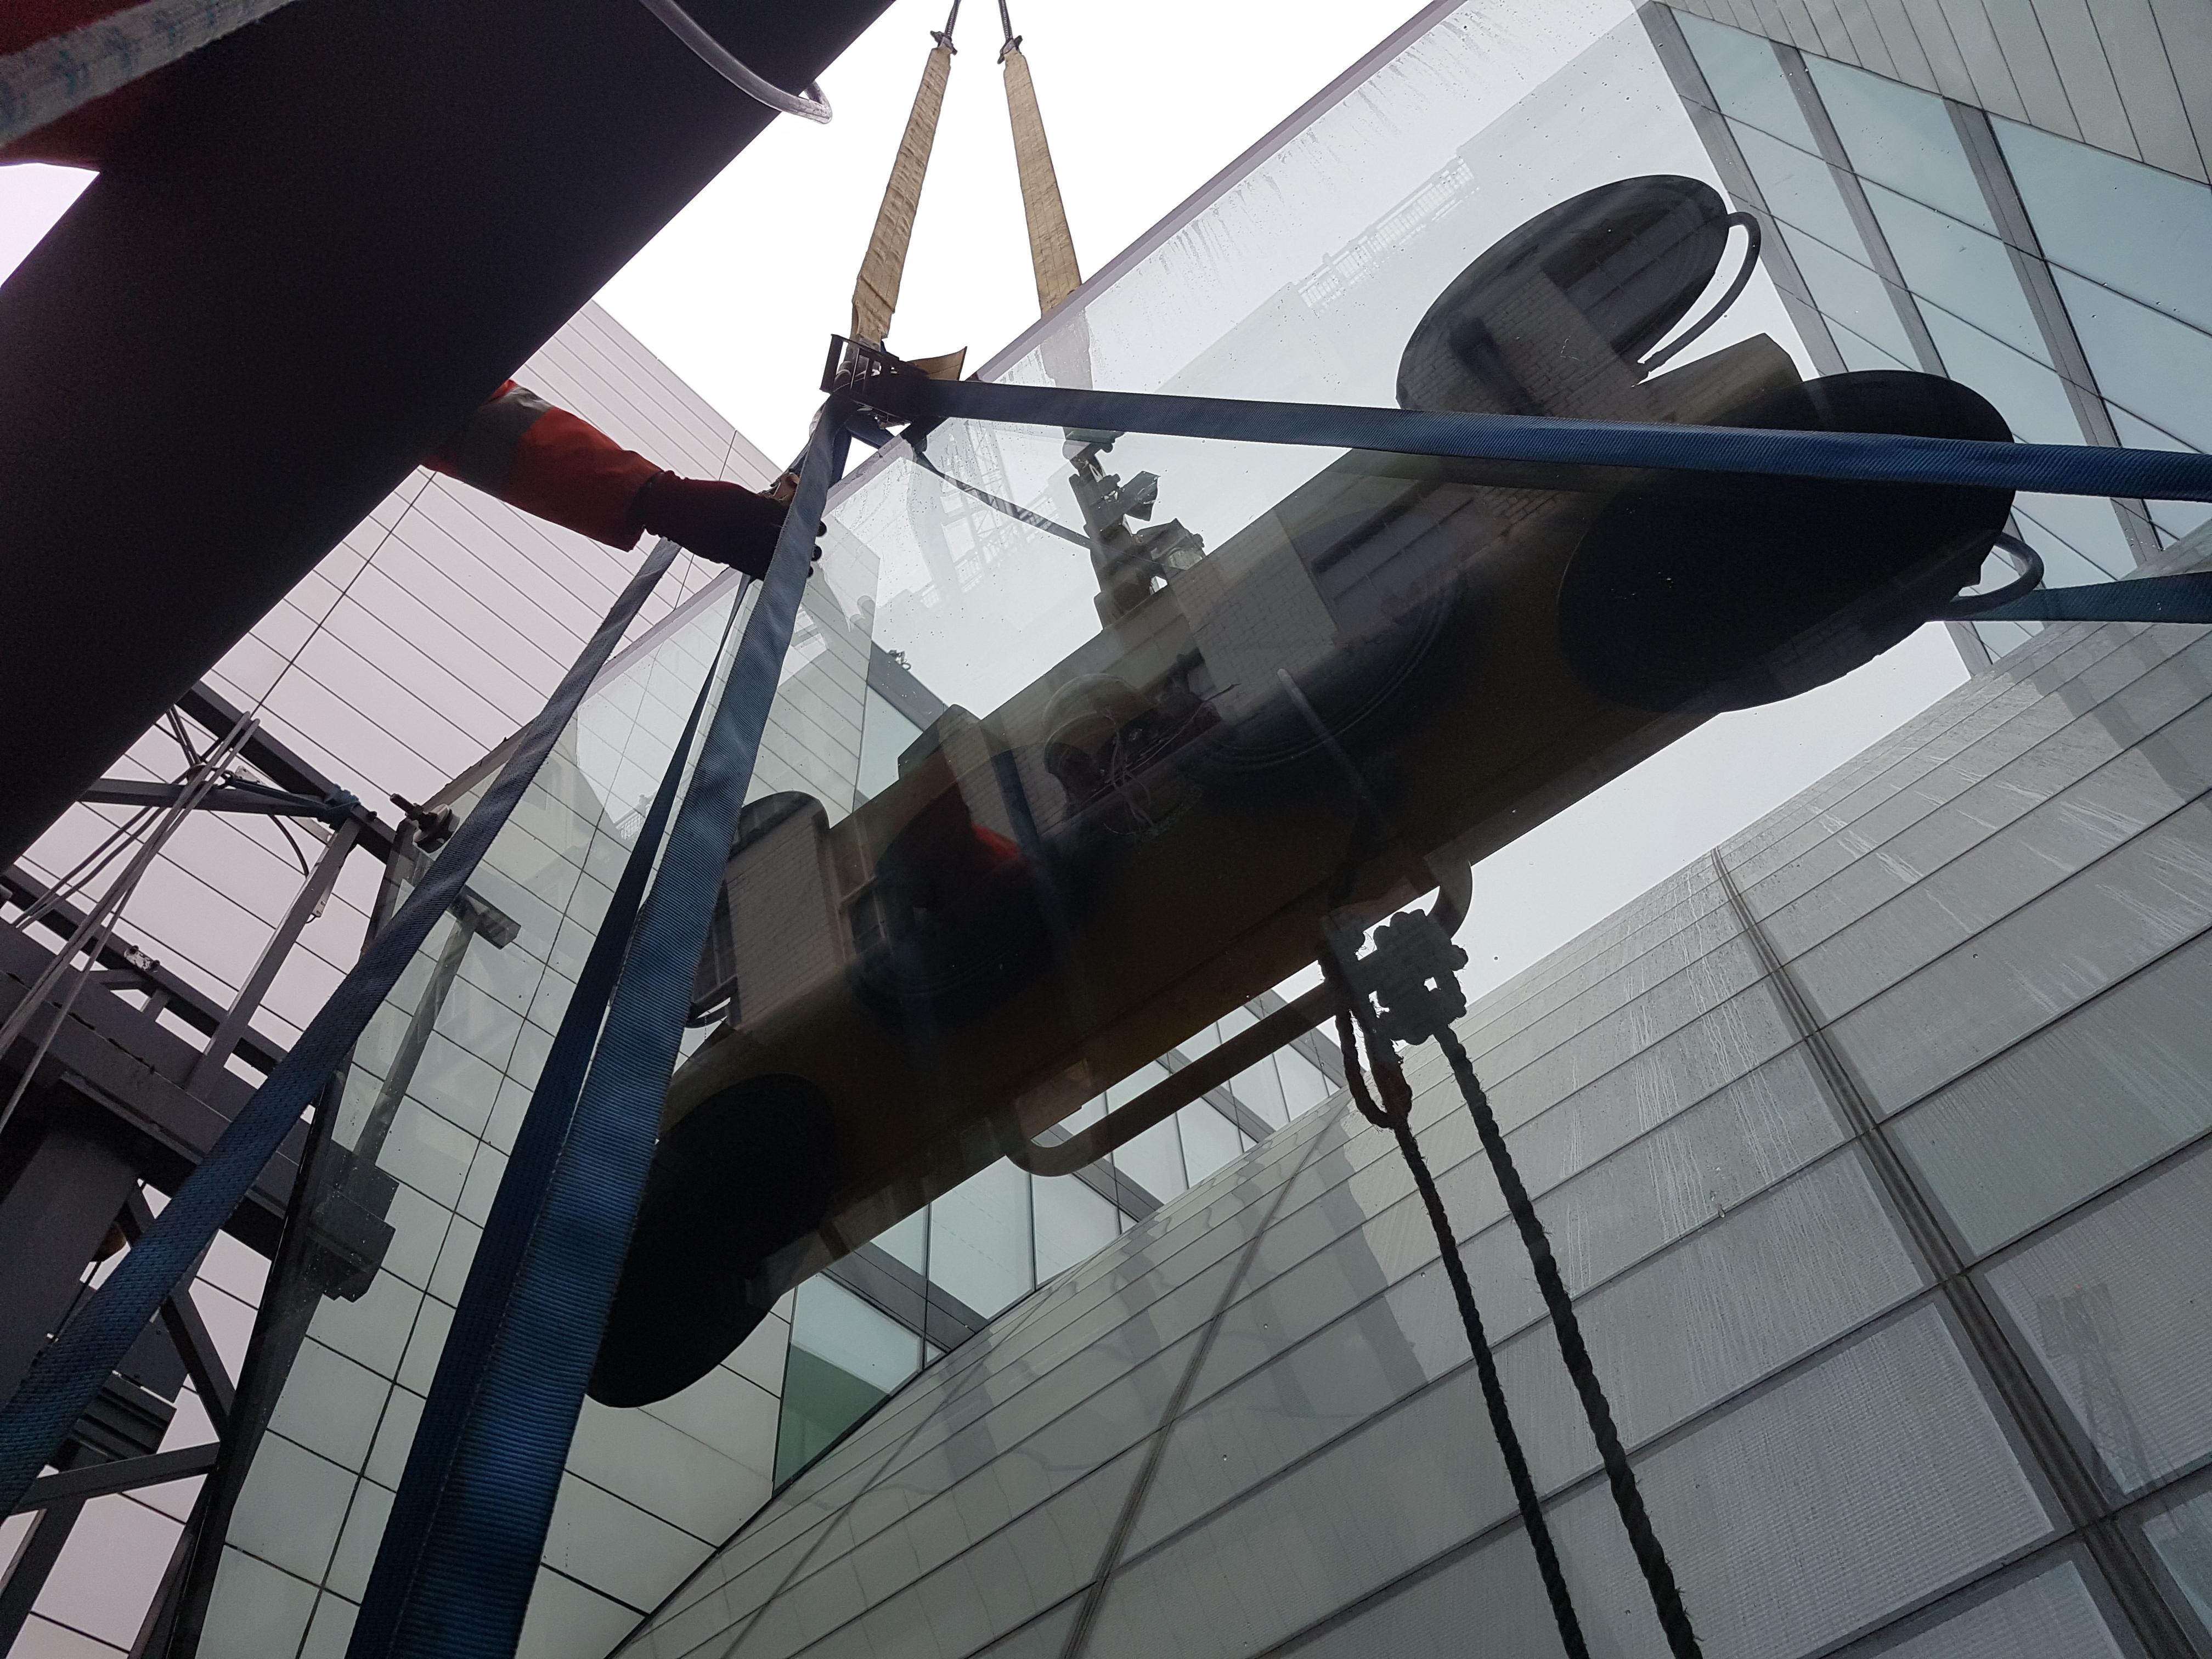 glass lifting operation